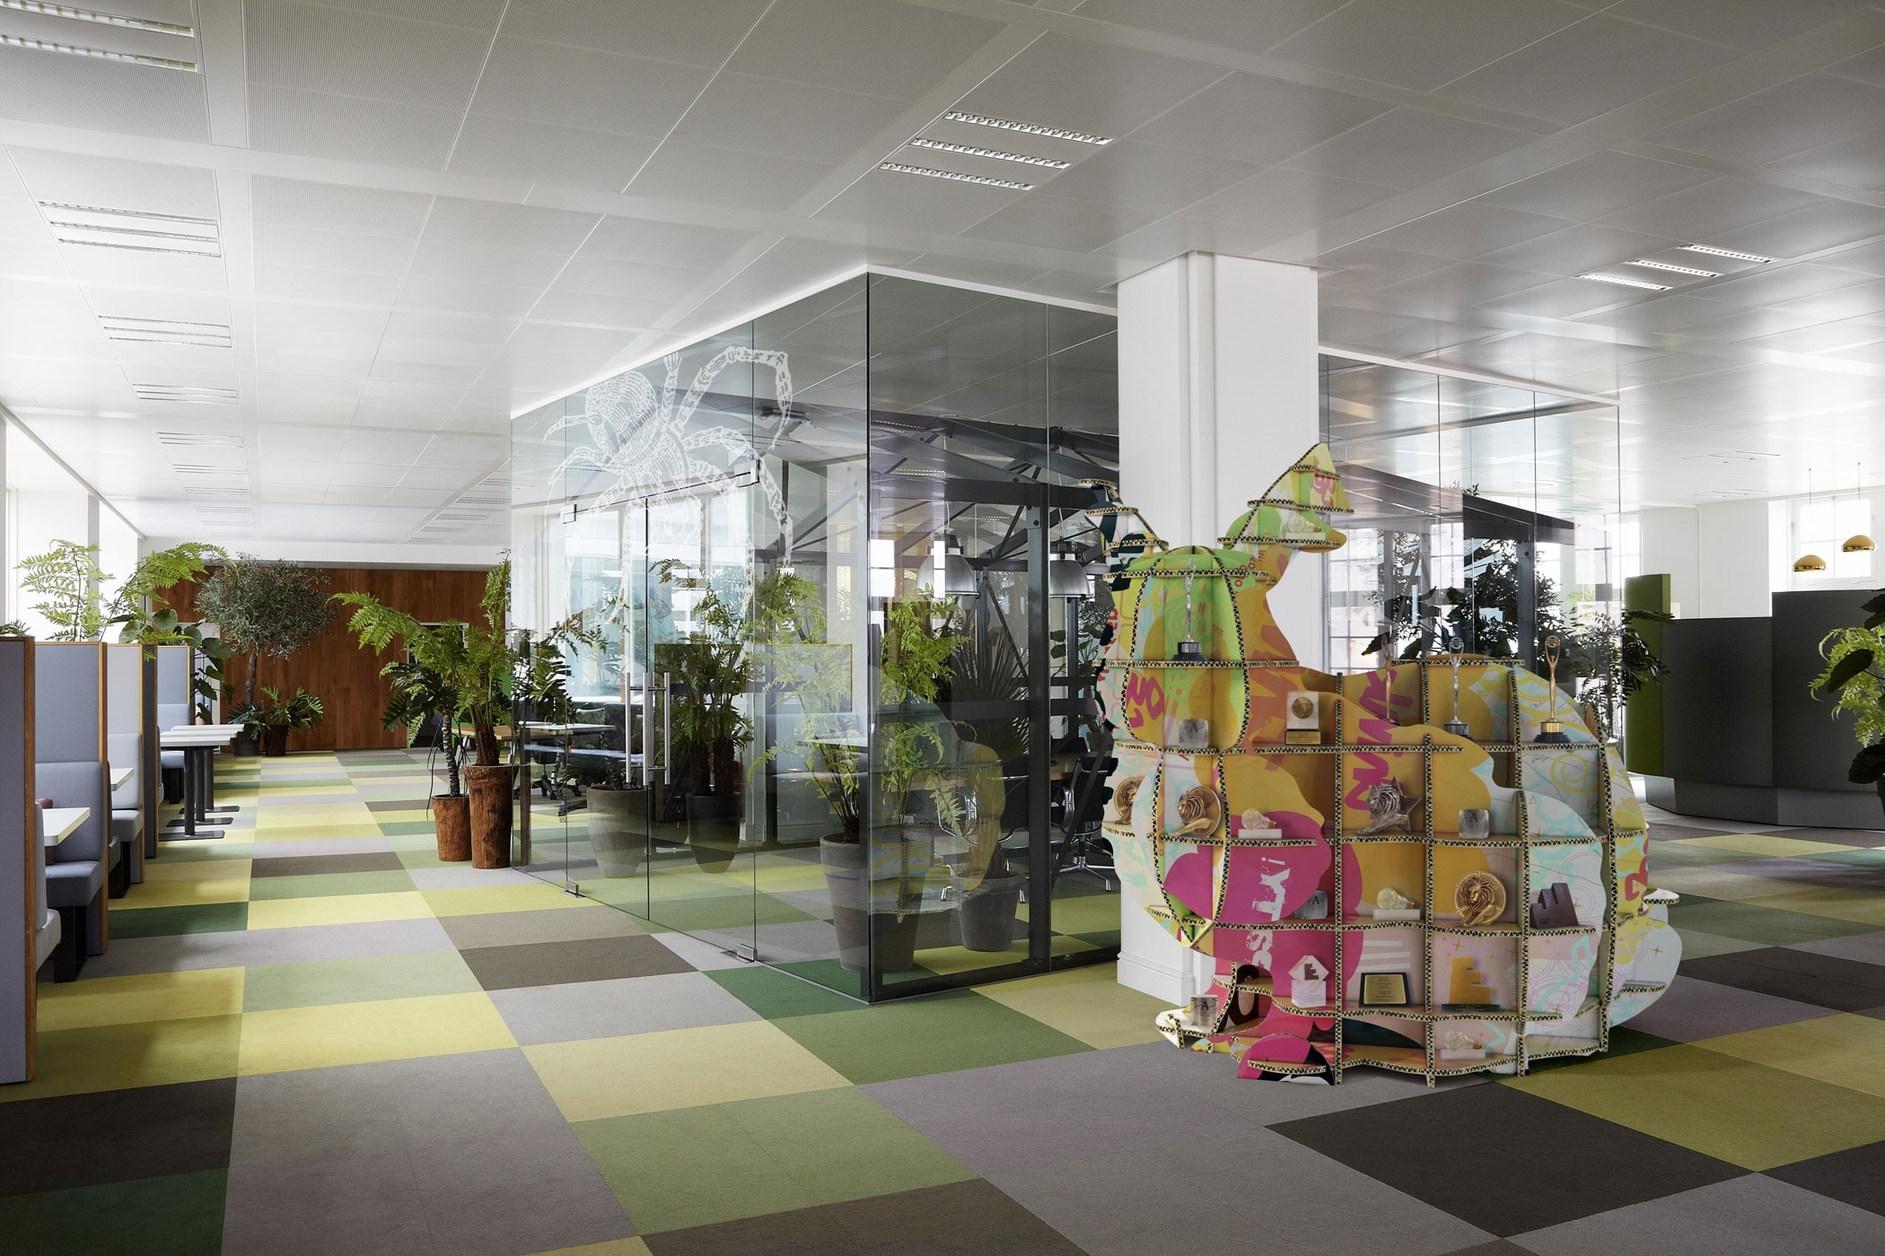 Jwt amsterdam office by koudenburg elsinga karmatrendz for Design agencies amsterdam